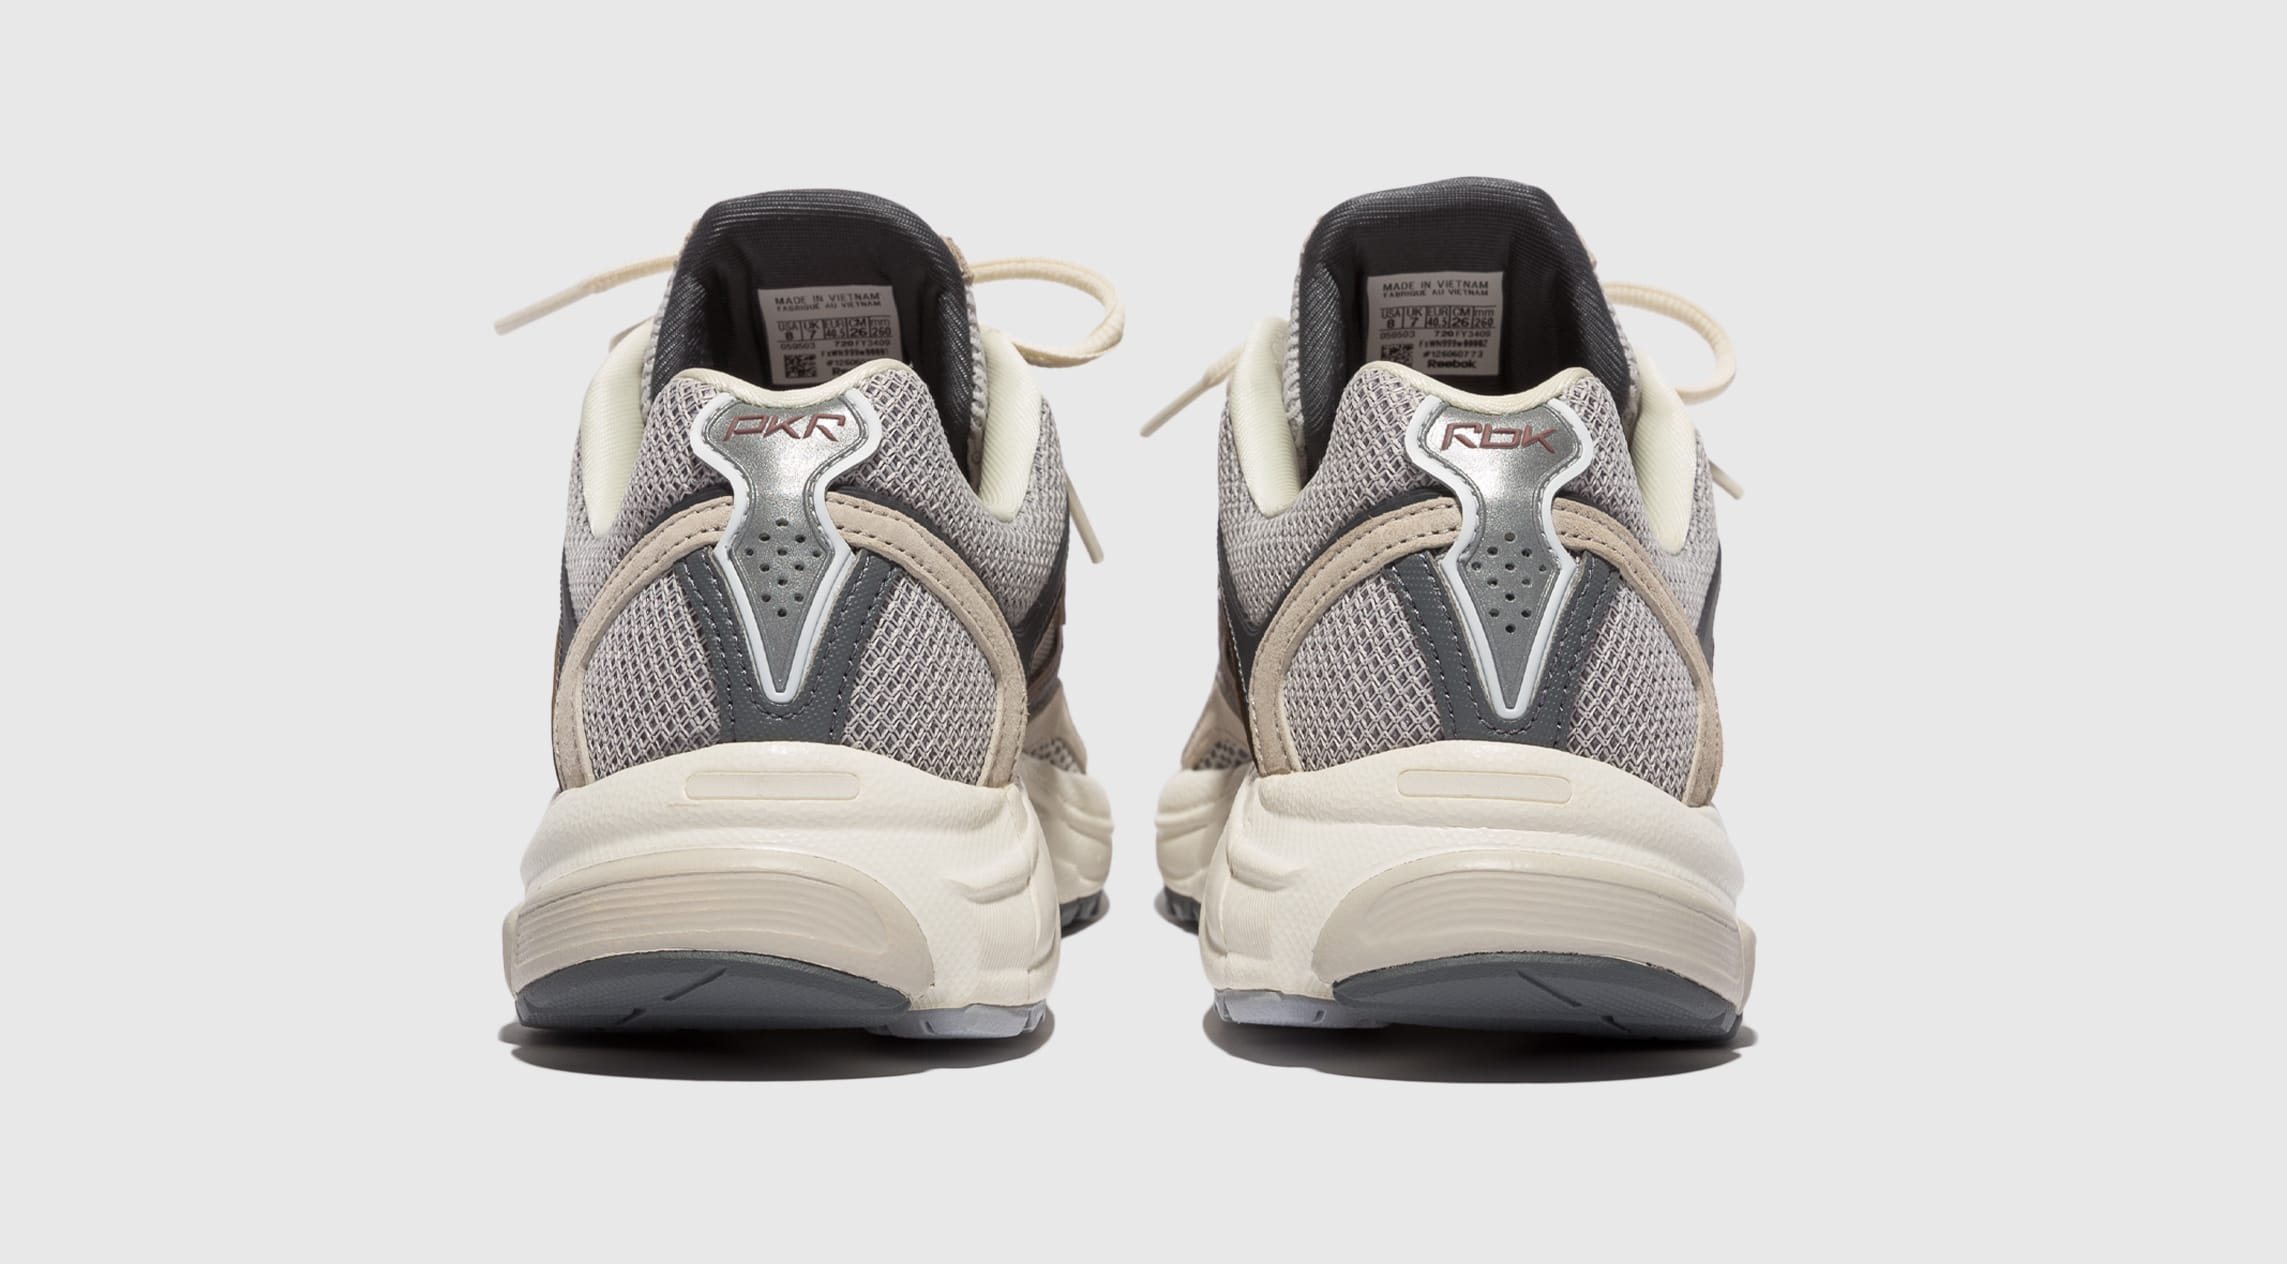 Packer Shoes x Reebok Trinity Premier Cream FY3409 Heel